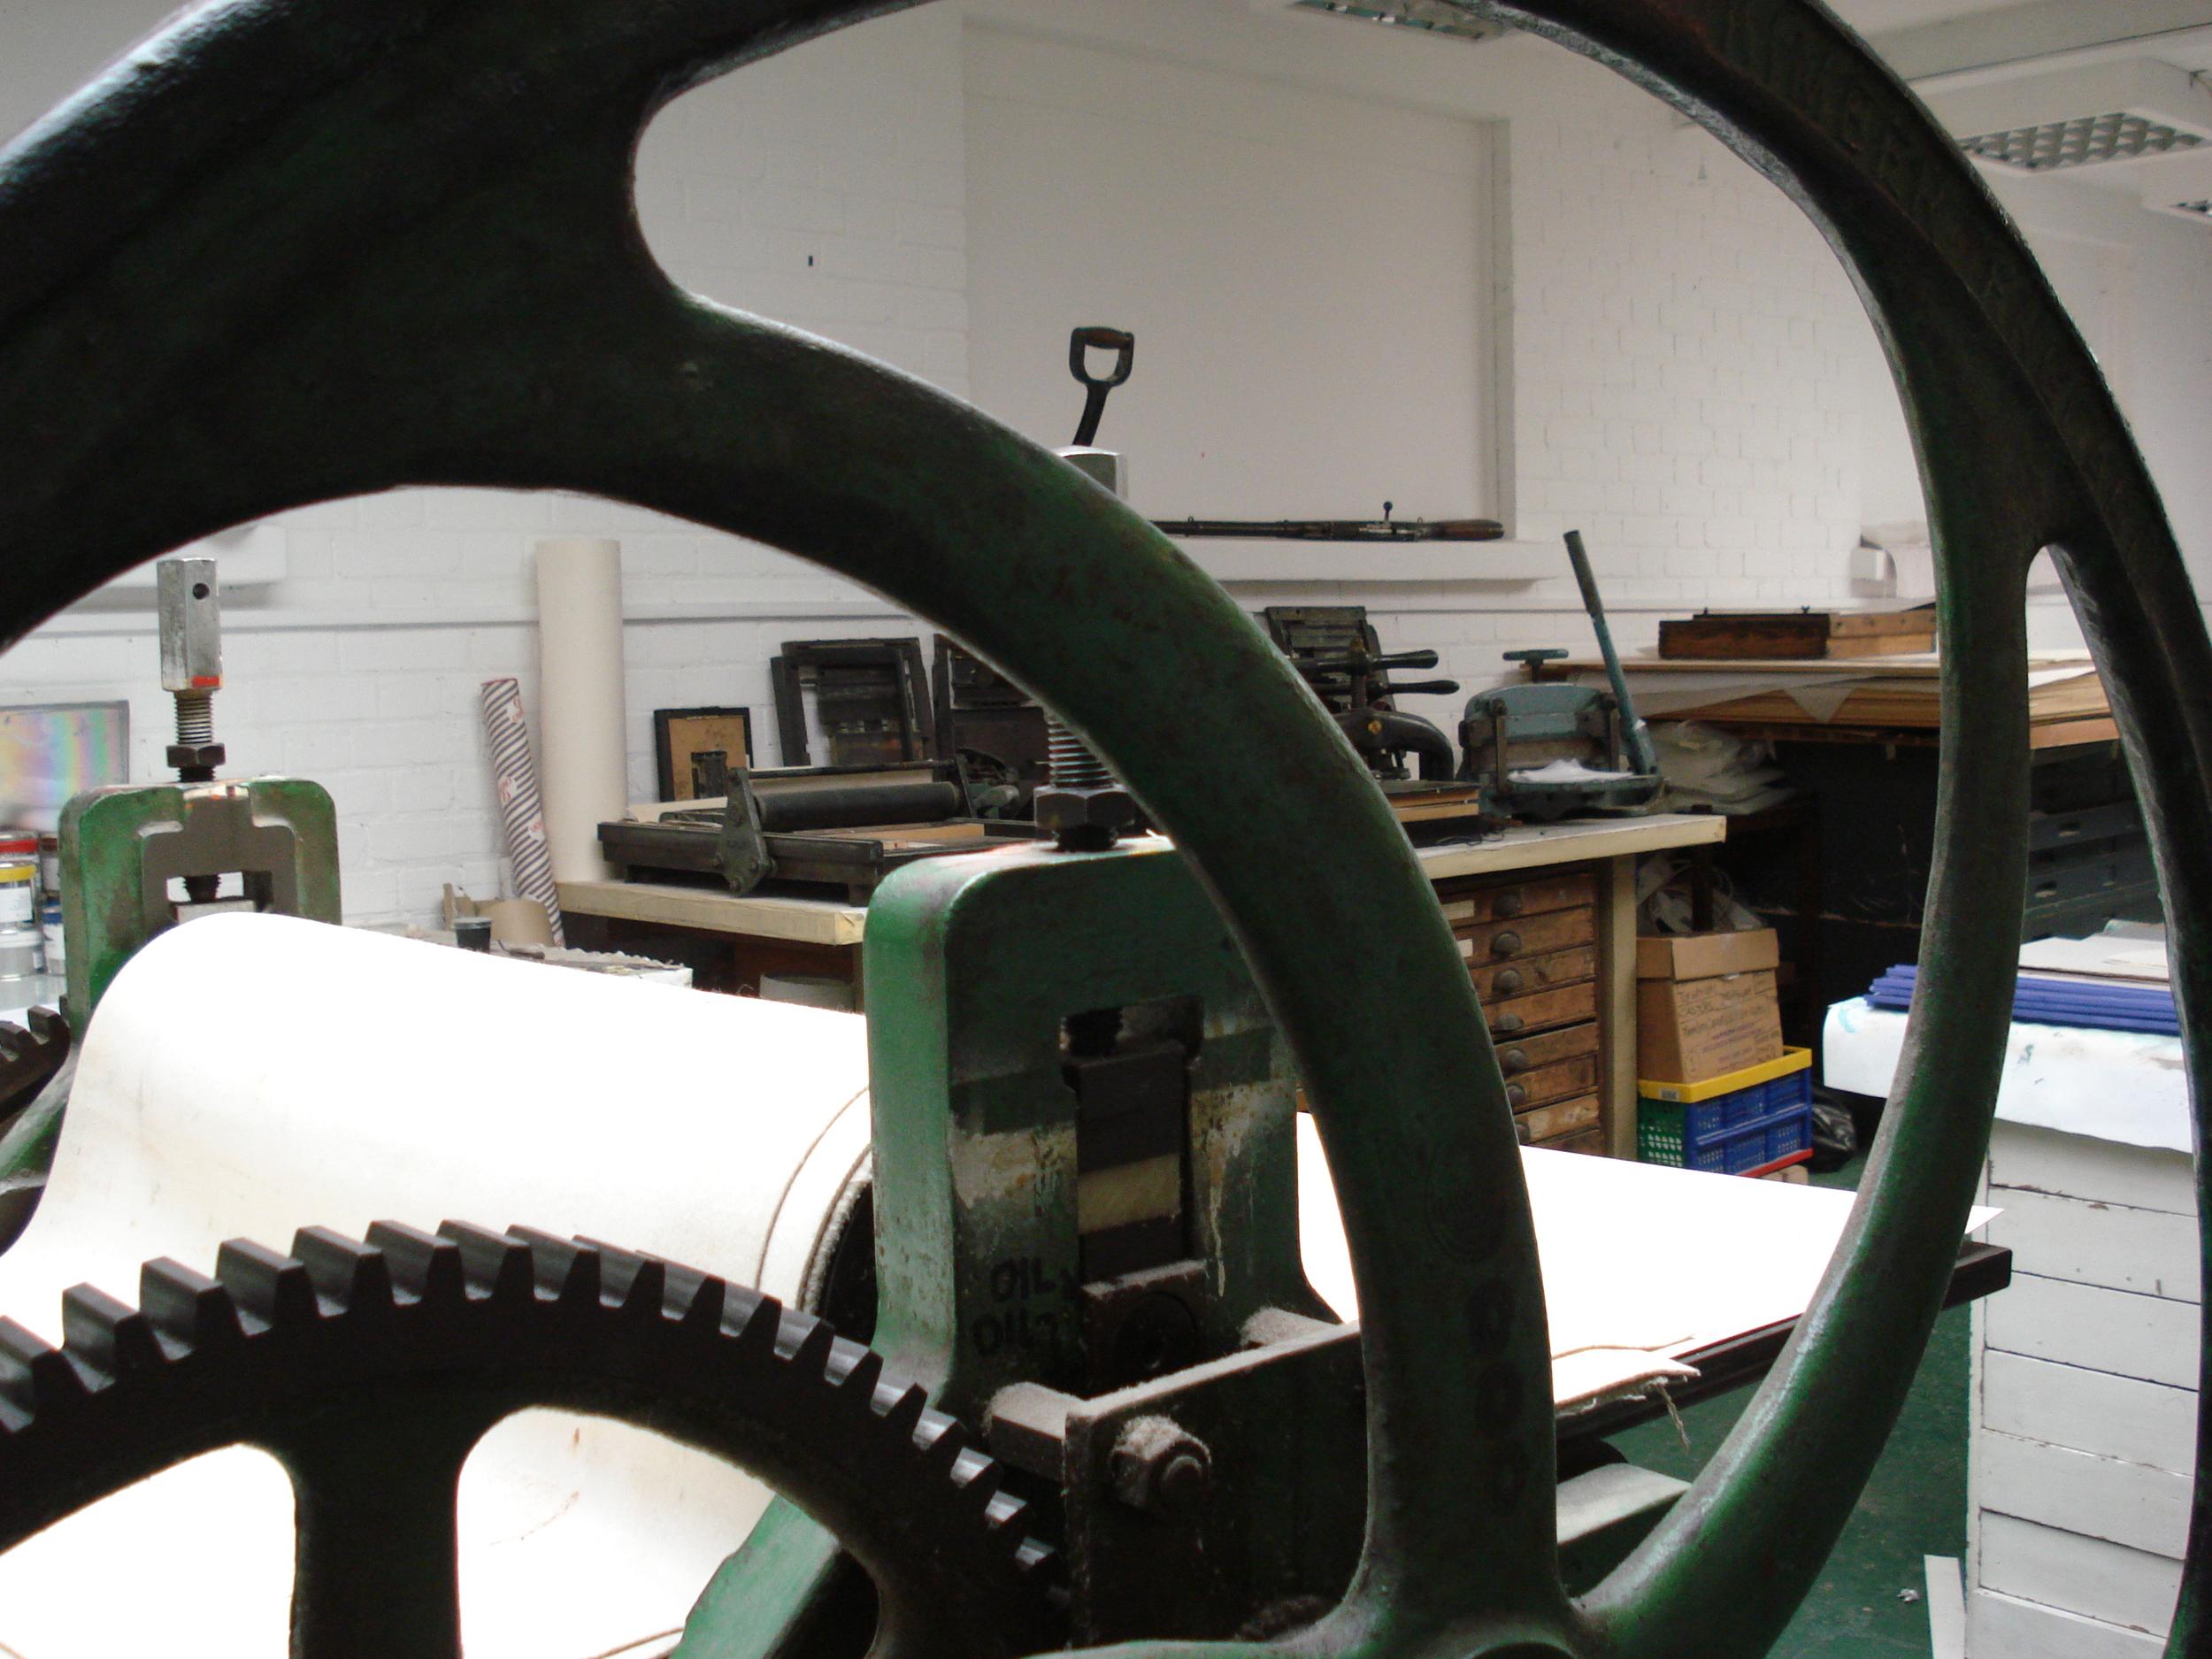 Studio: Printmaking